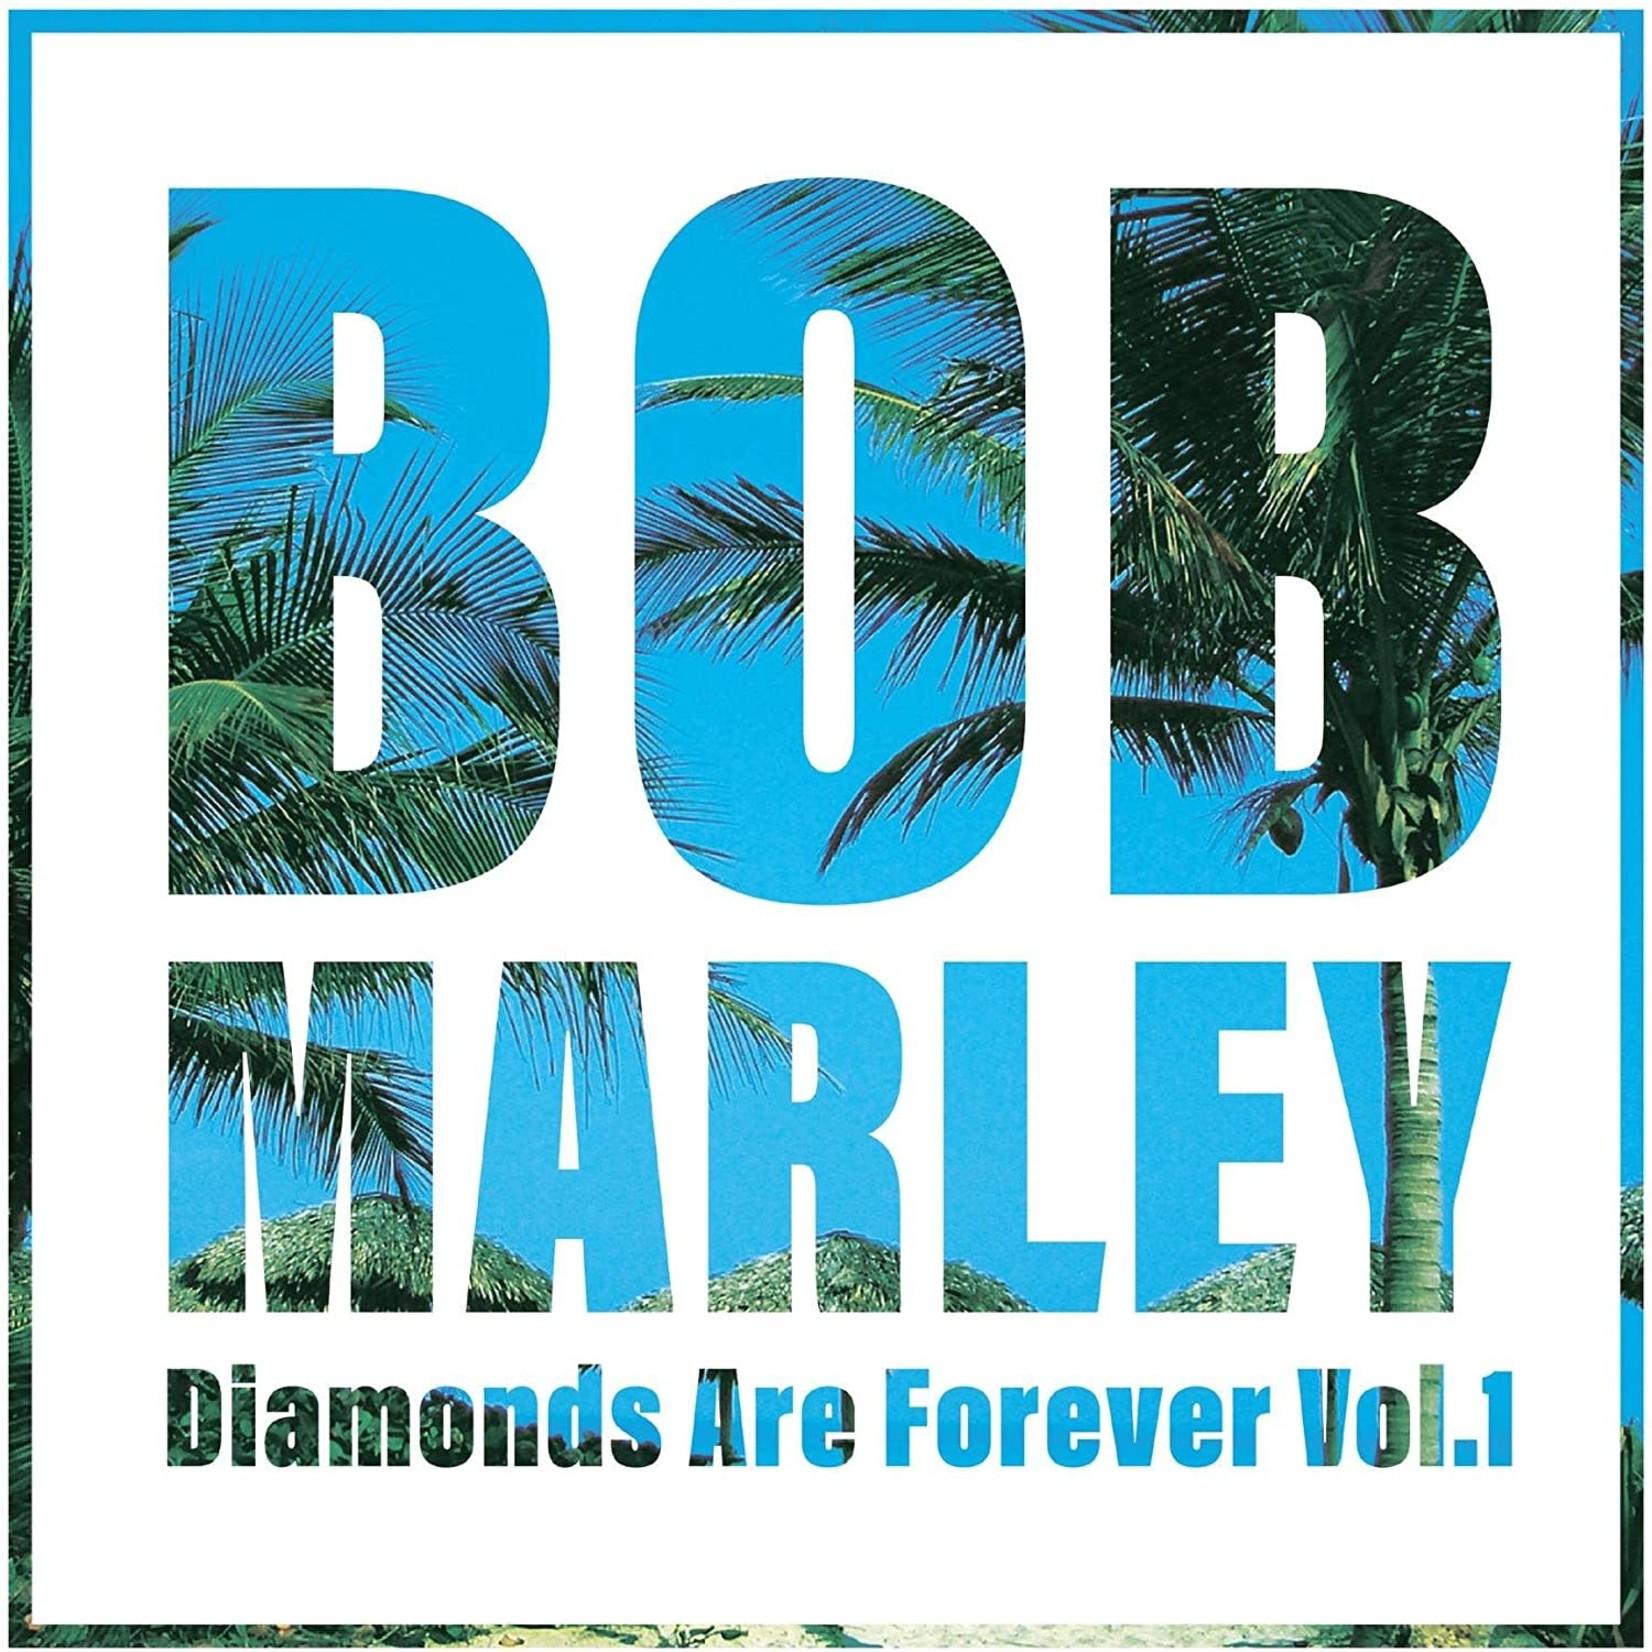 BOB MARLEY DIAMONDS ARE FOREVER VOL.1